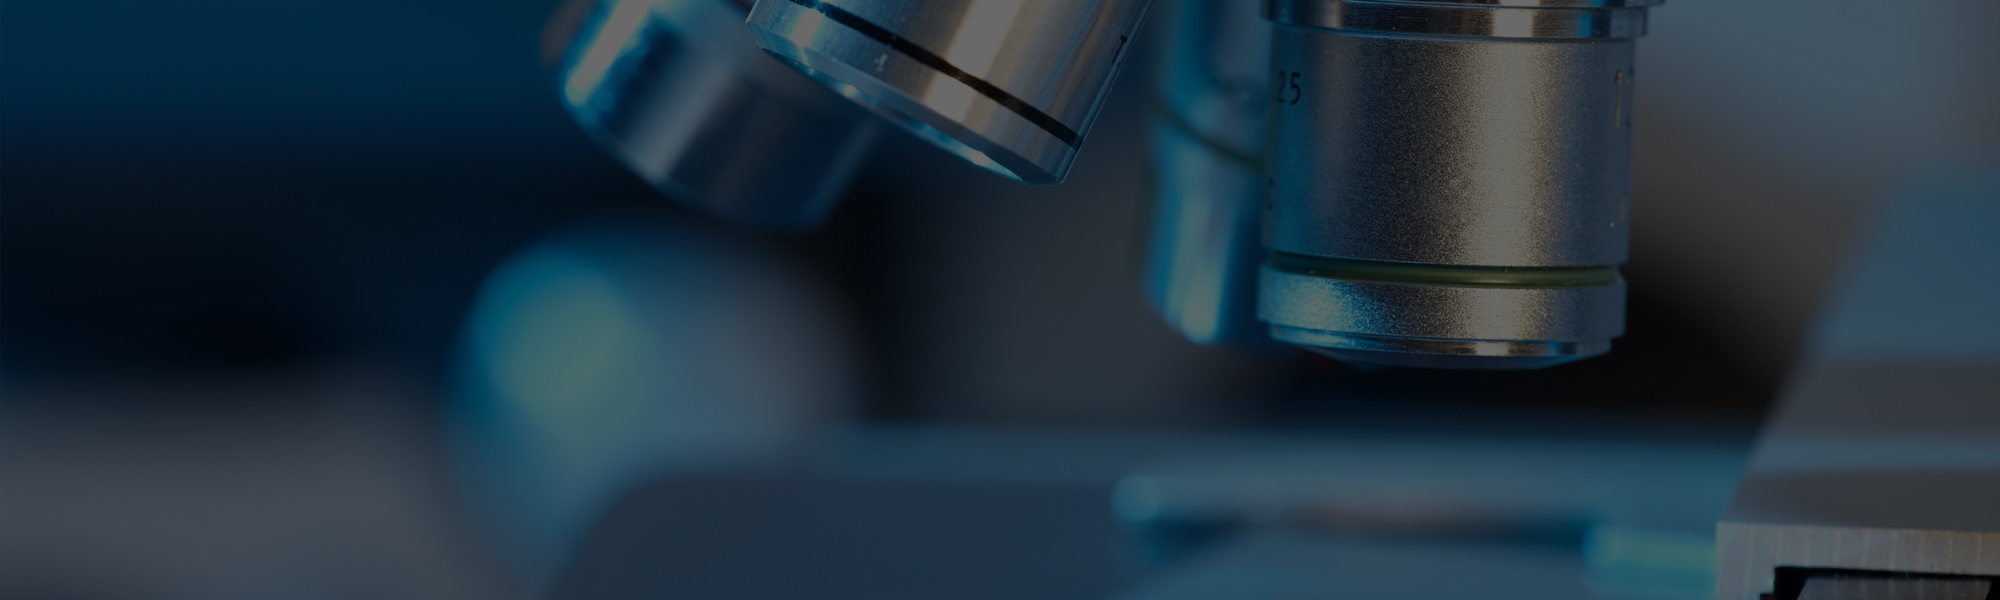 UNIDO Laboratory Directory by Viasoft